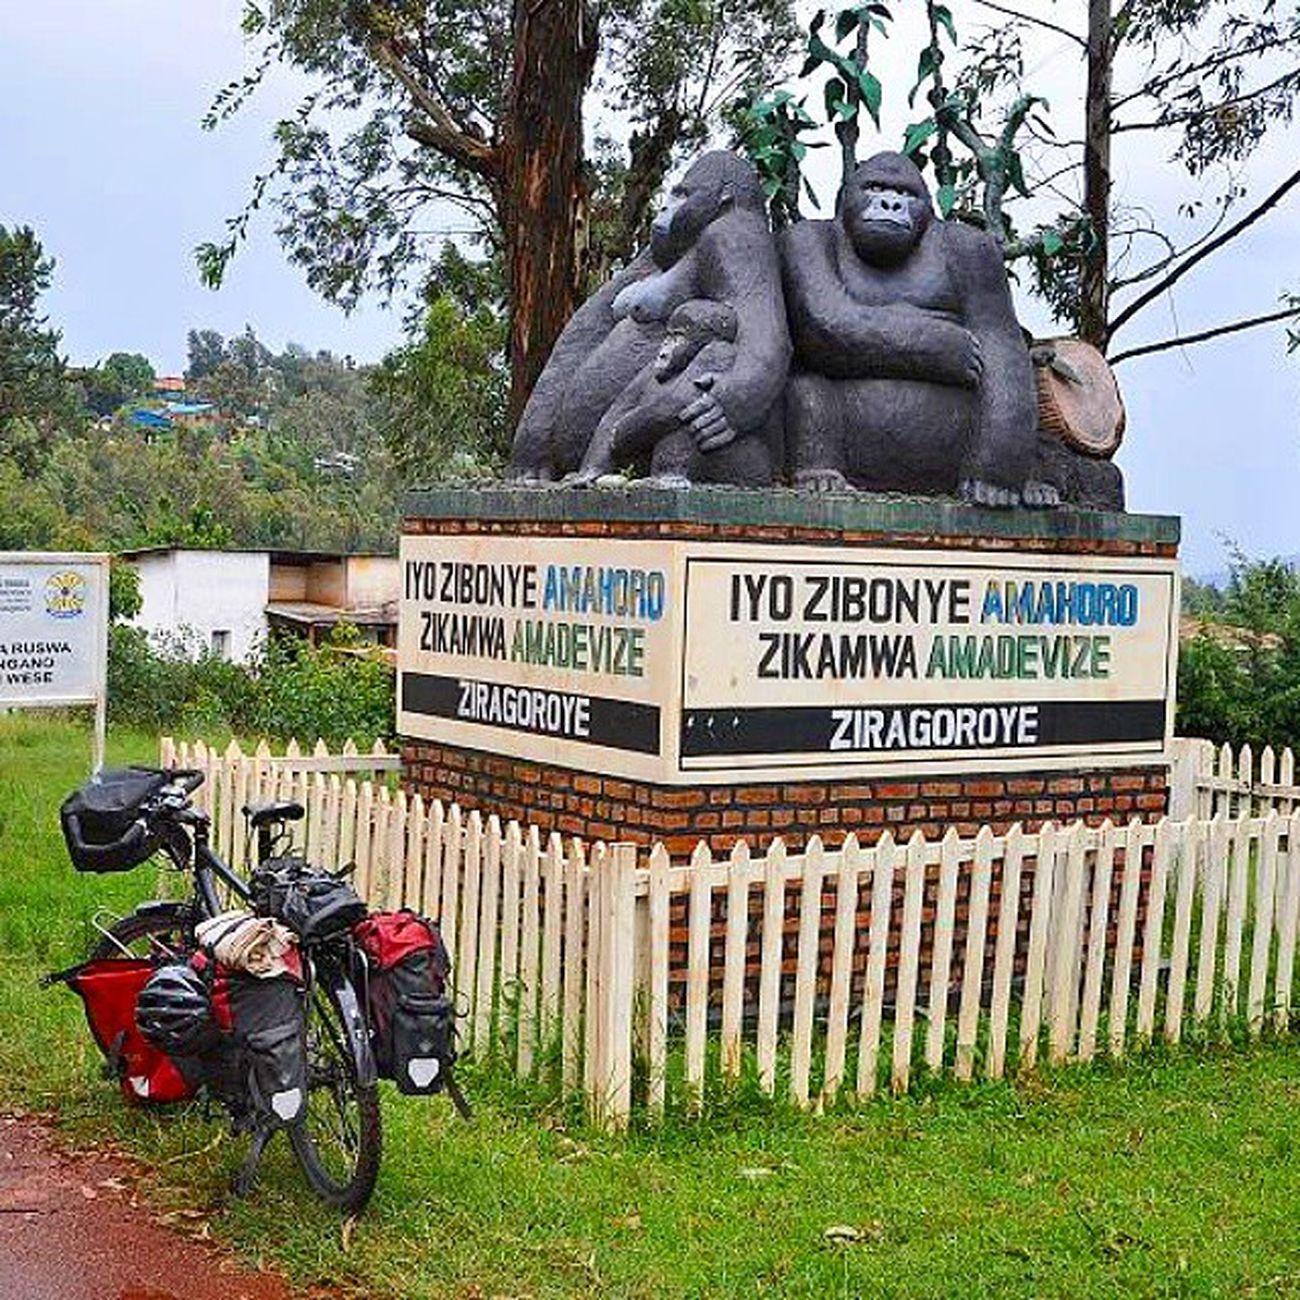 Once in East-Africa: entering Virunga Volcano mountains in Rwanda , on my way to Uganda  . Biketouring Travel Instatravel 😚 Cycling Fahrrad Africa Gorilla Adventurecycling Nofilter Latergram Volcano Mountains Eastafrica Bikingafrica Cycling Reise Afrika Ruanda